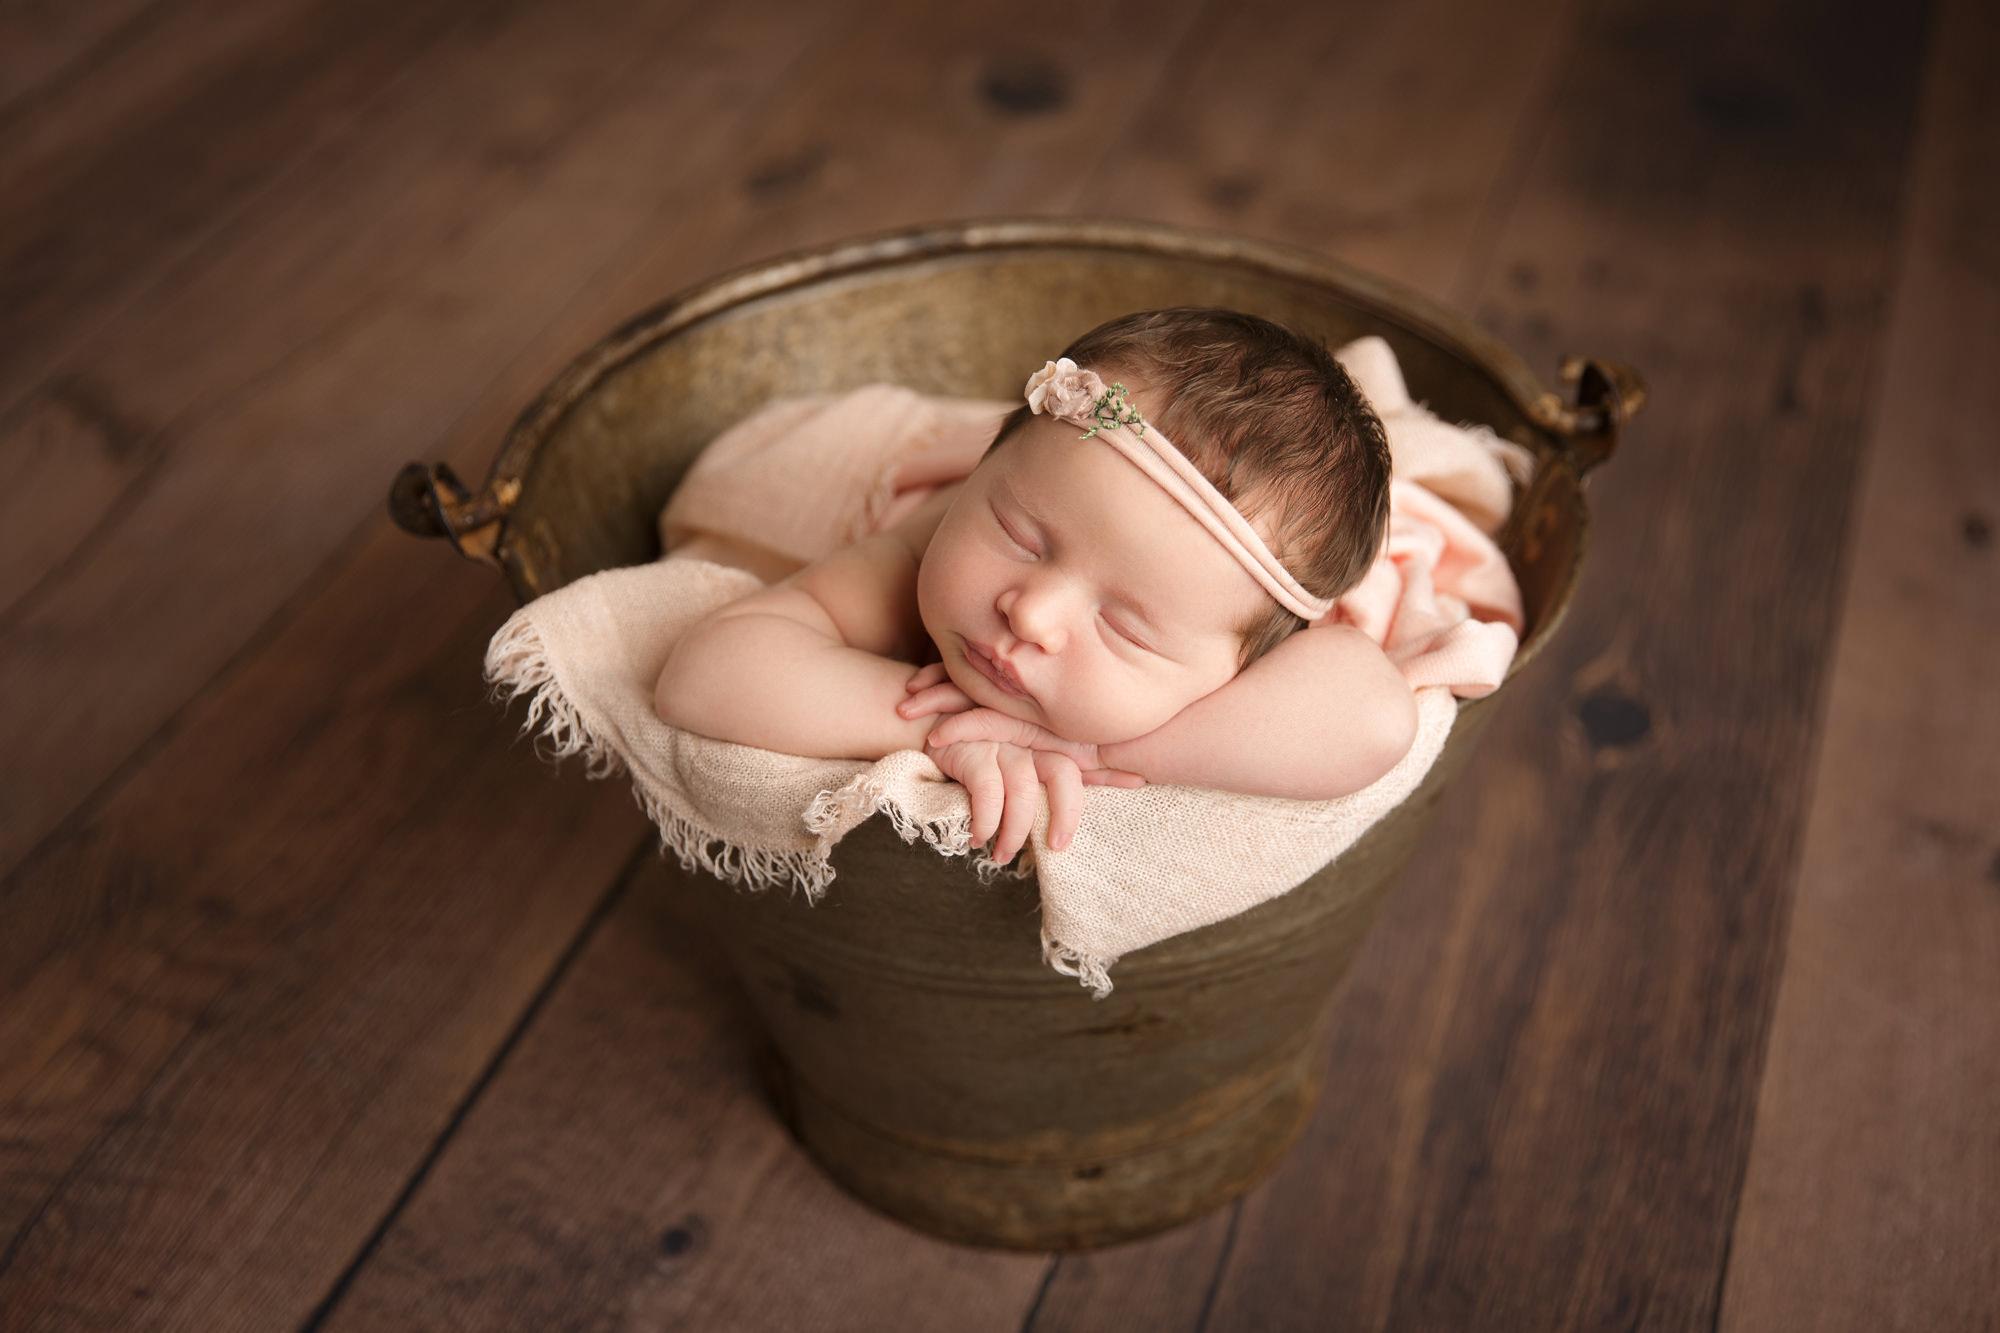 baby-fotoshooting-oberhausen